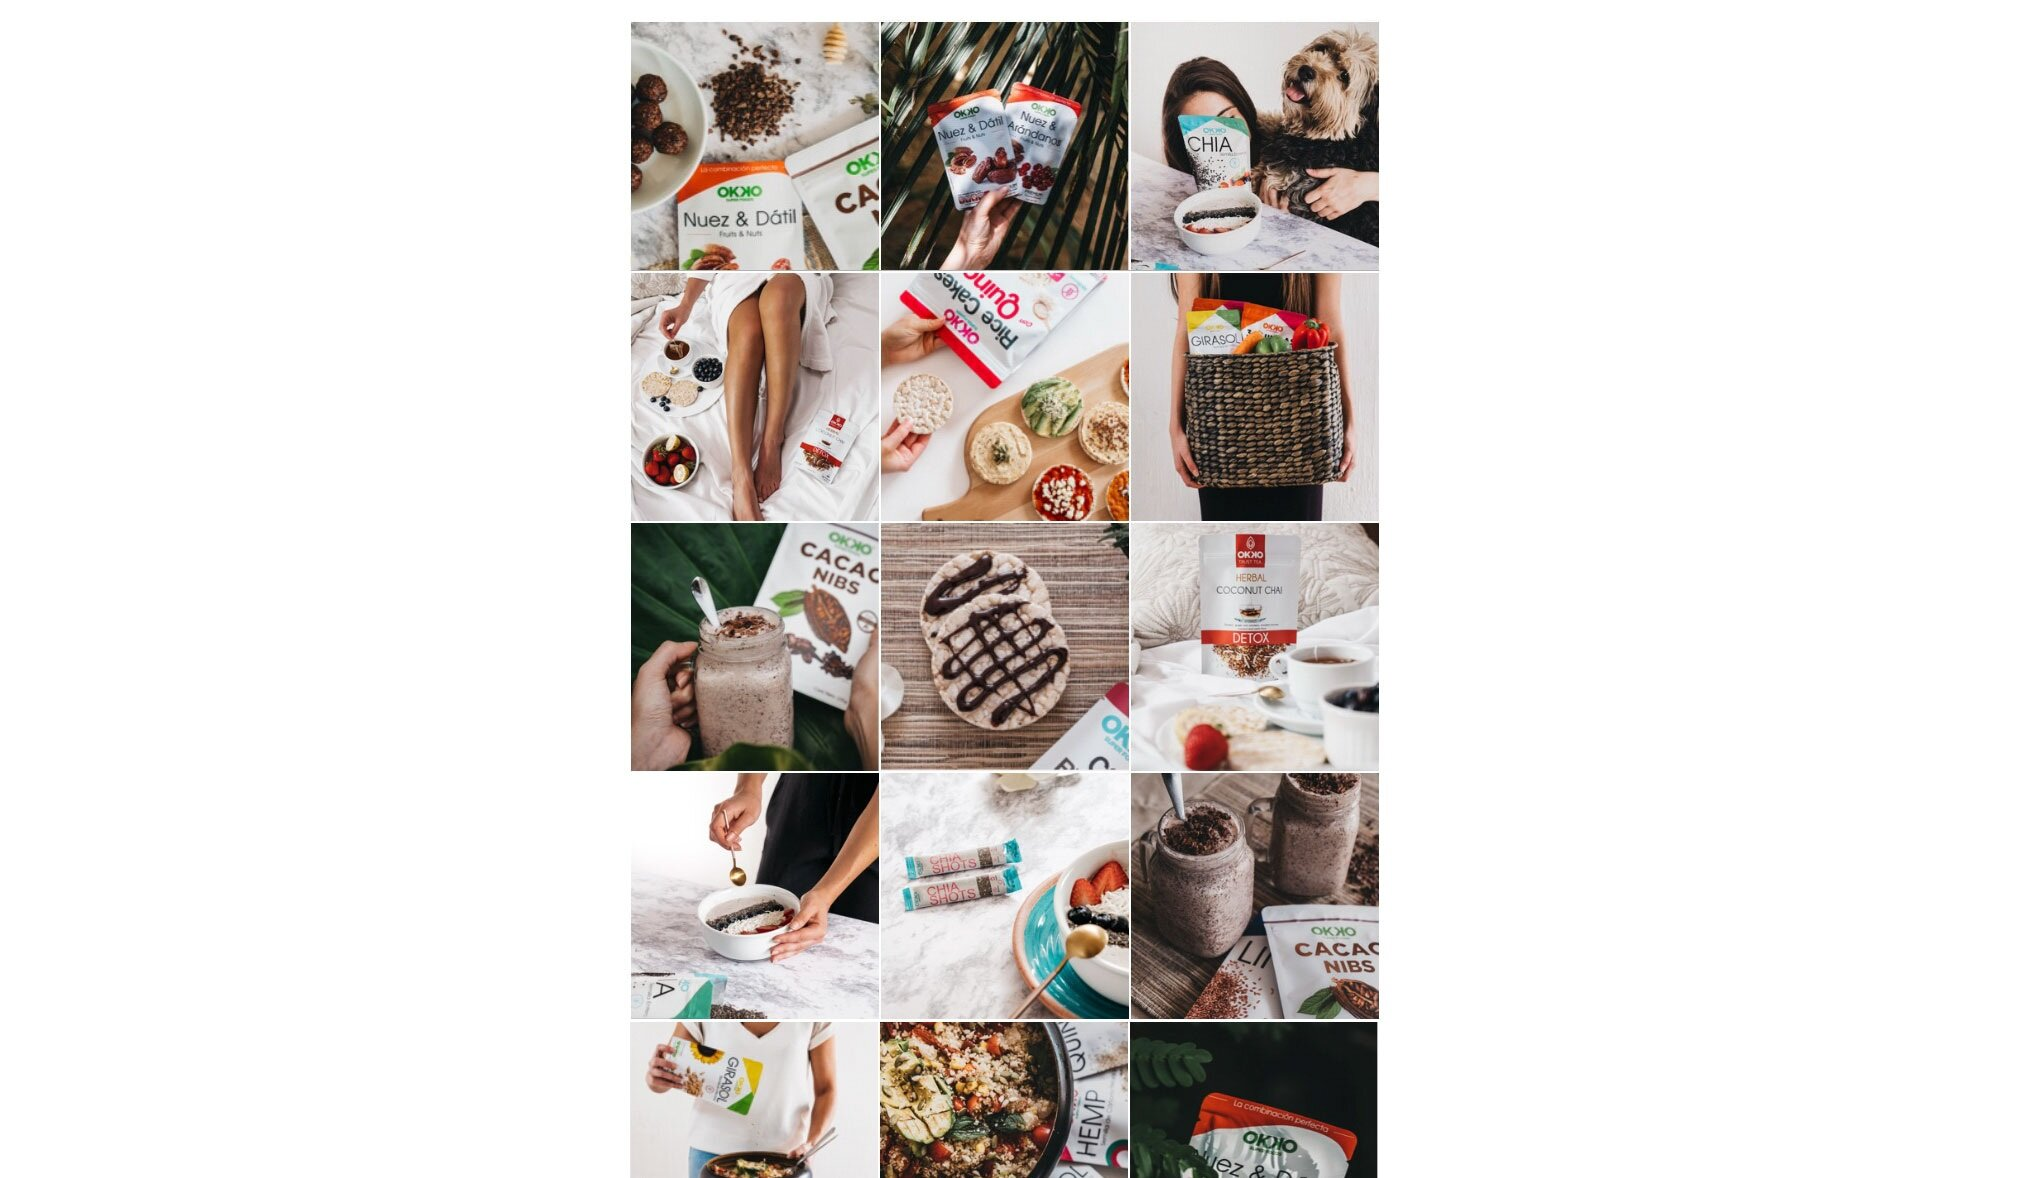 okko-superfoods-product-photography-6